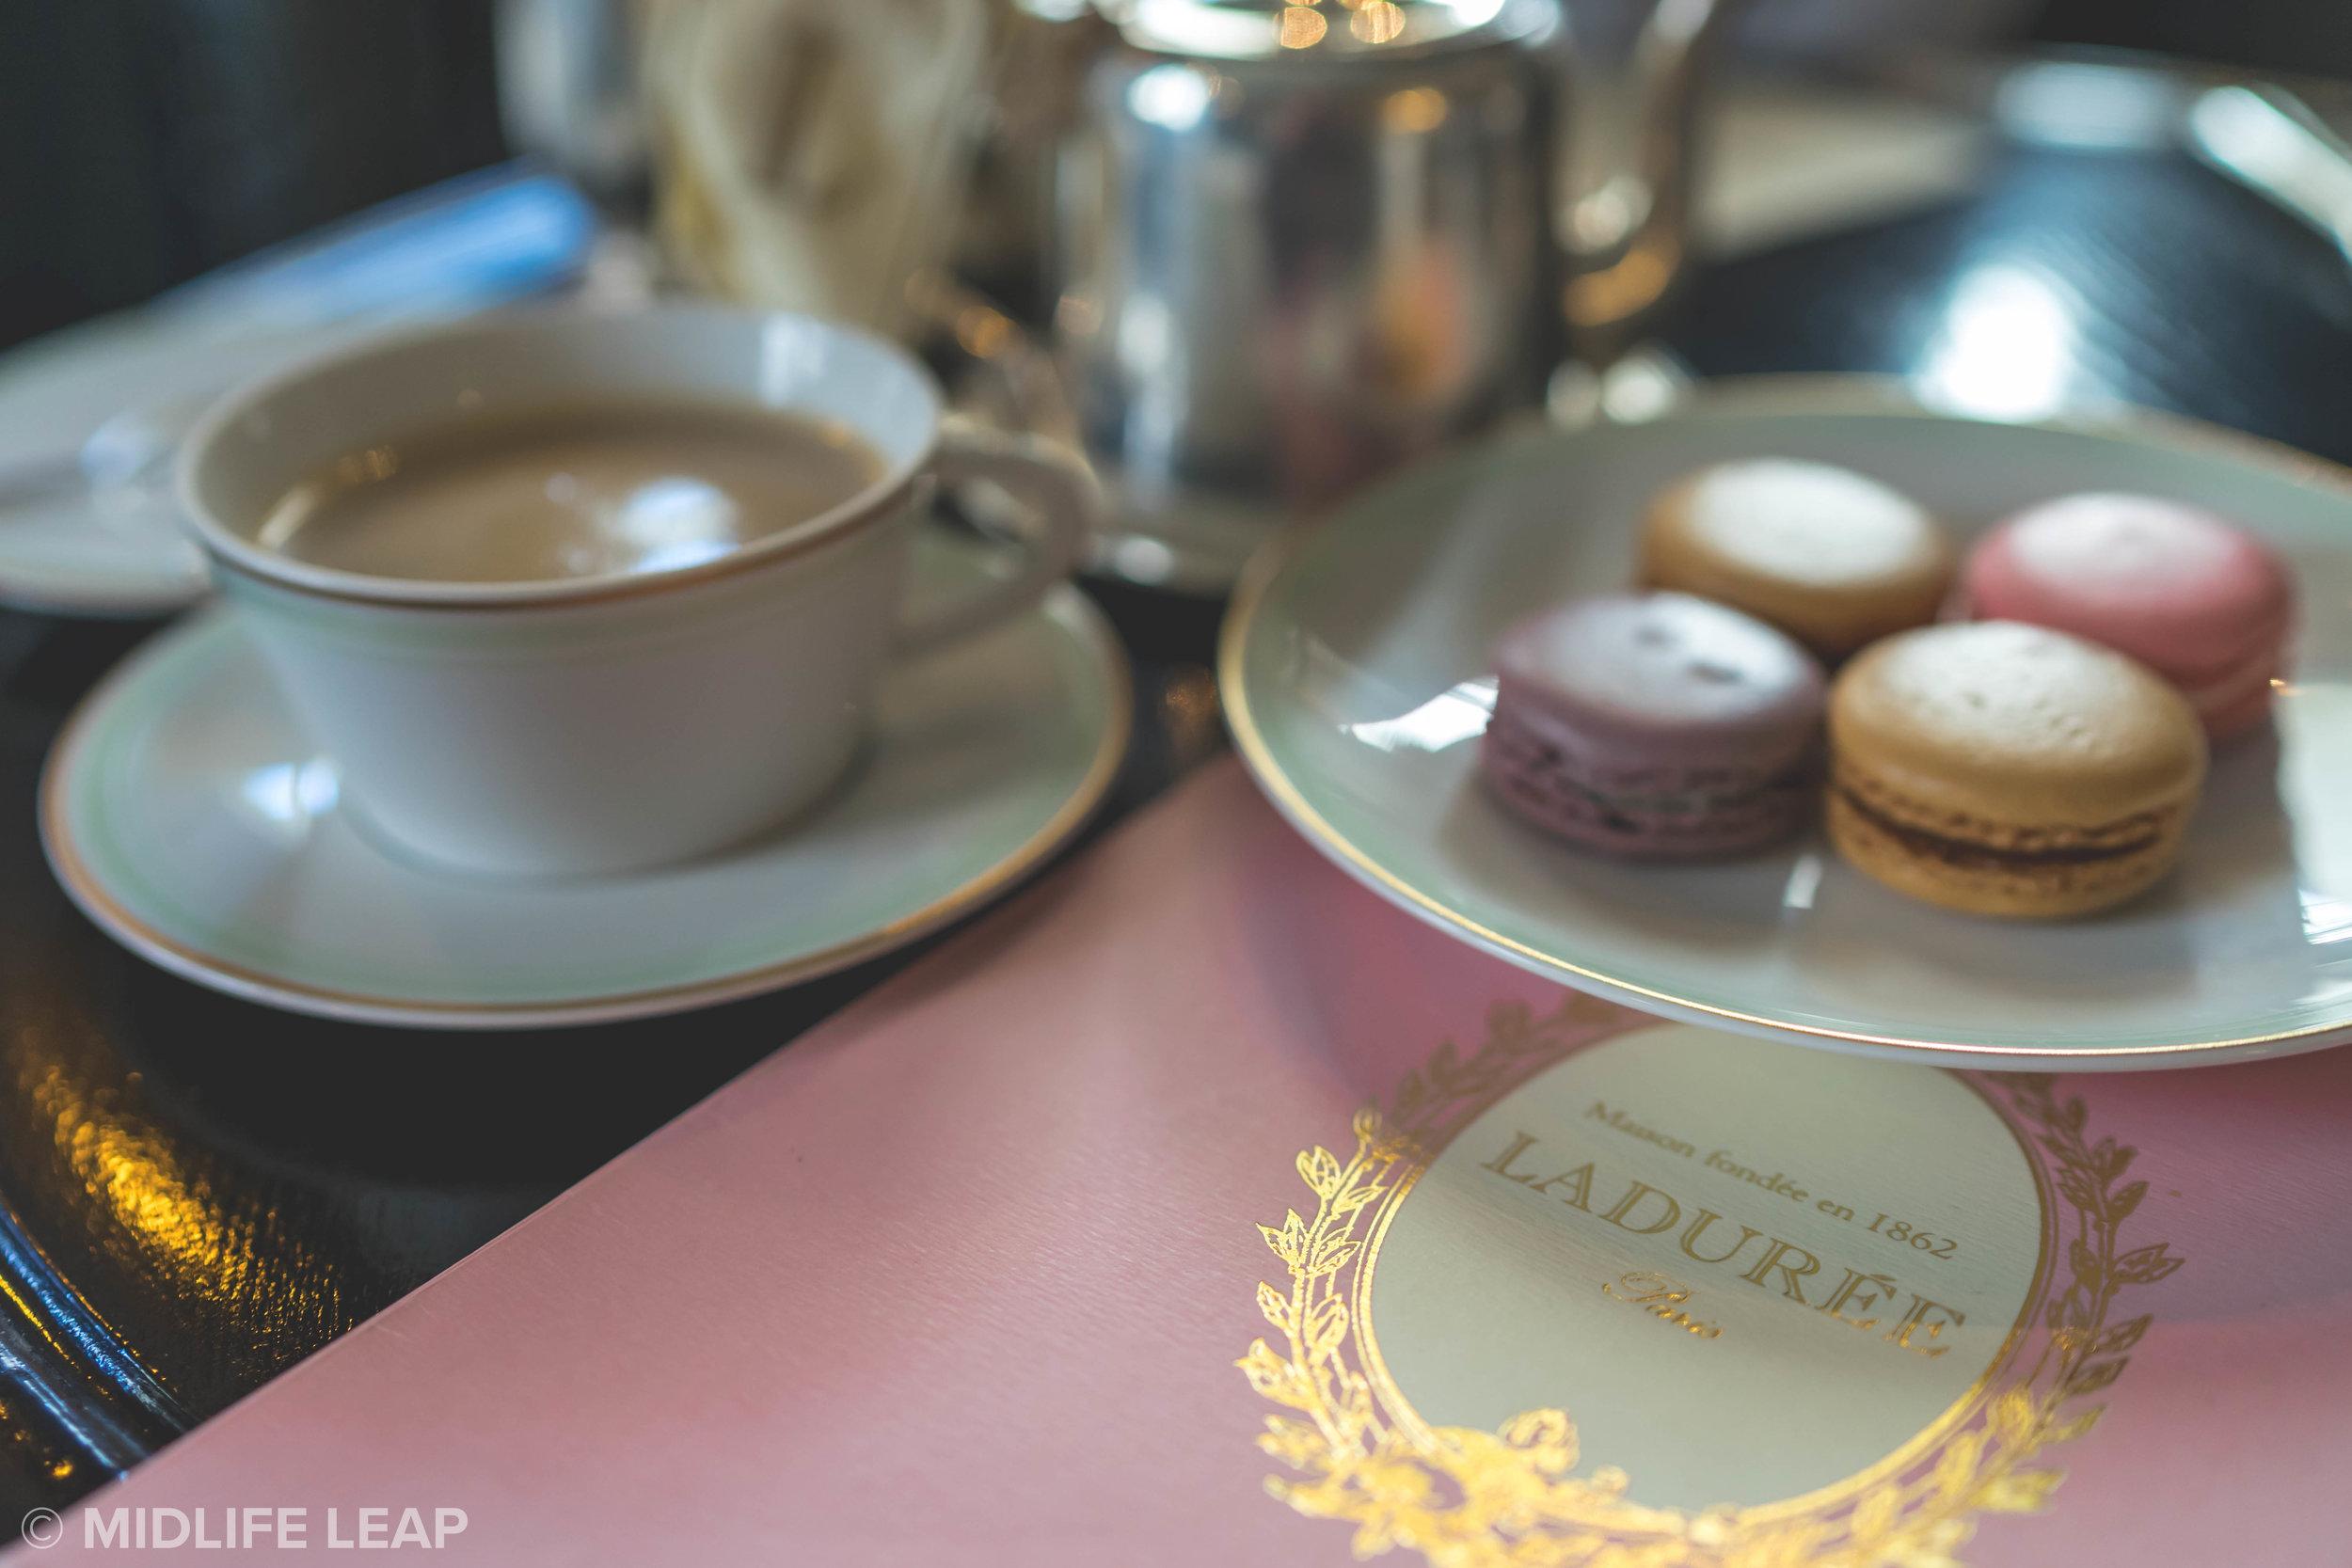 laudree-the-best-macarons-in-paris